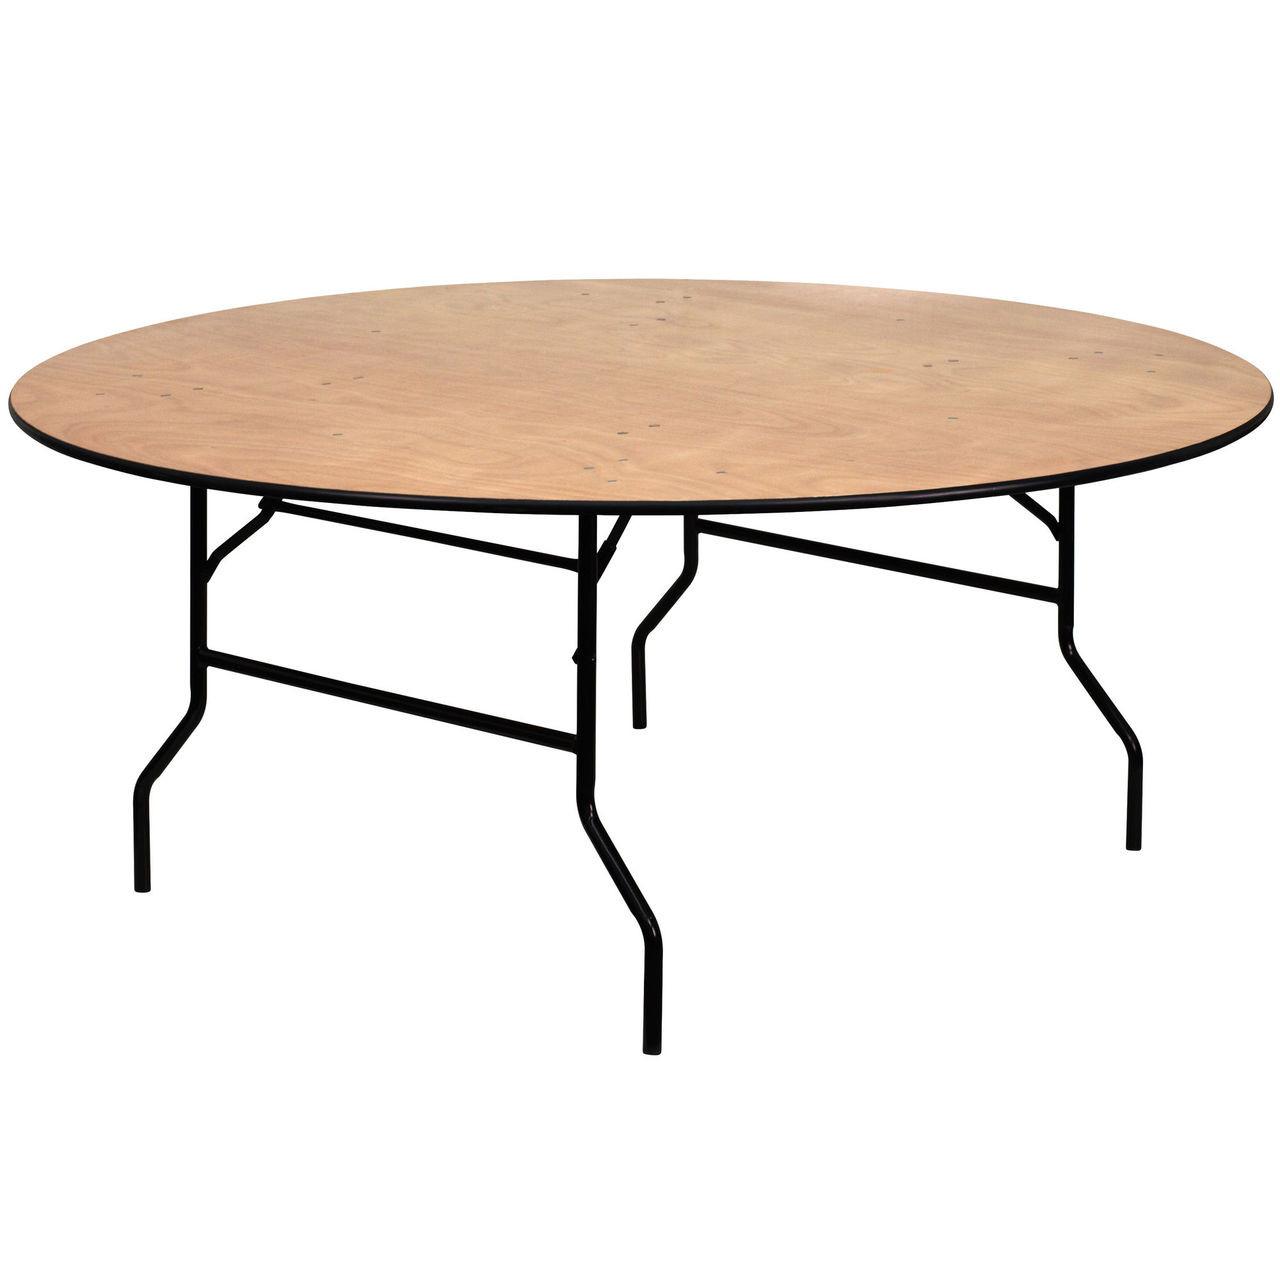 advantage 6 ft round wood folding banquet table yt wrft72 tbl gg